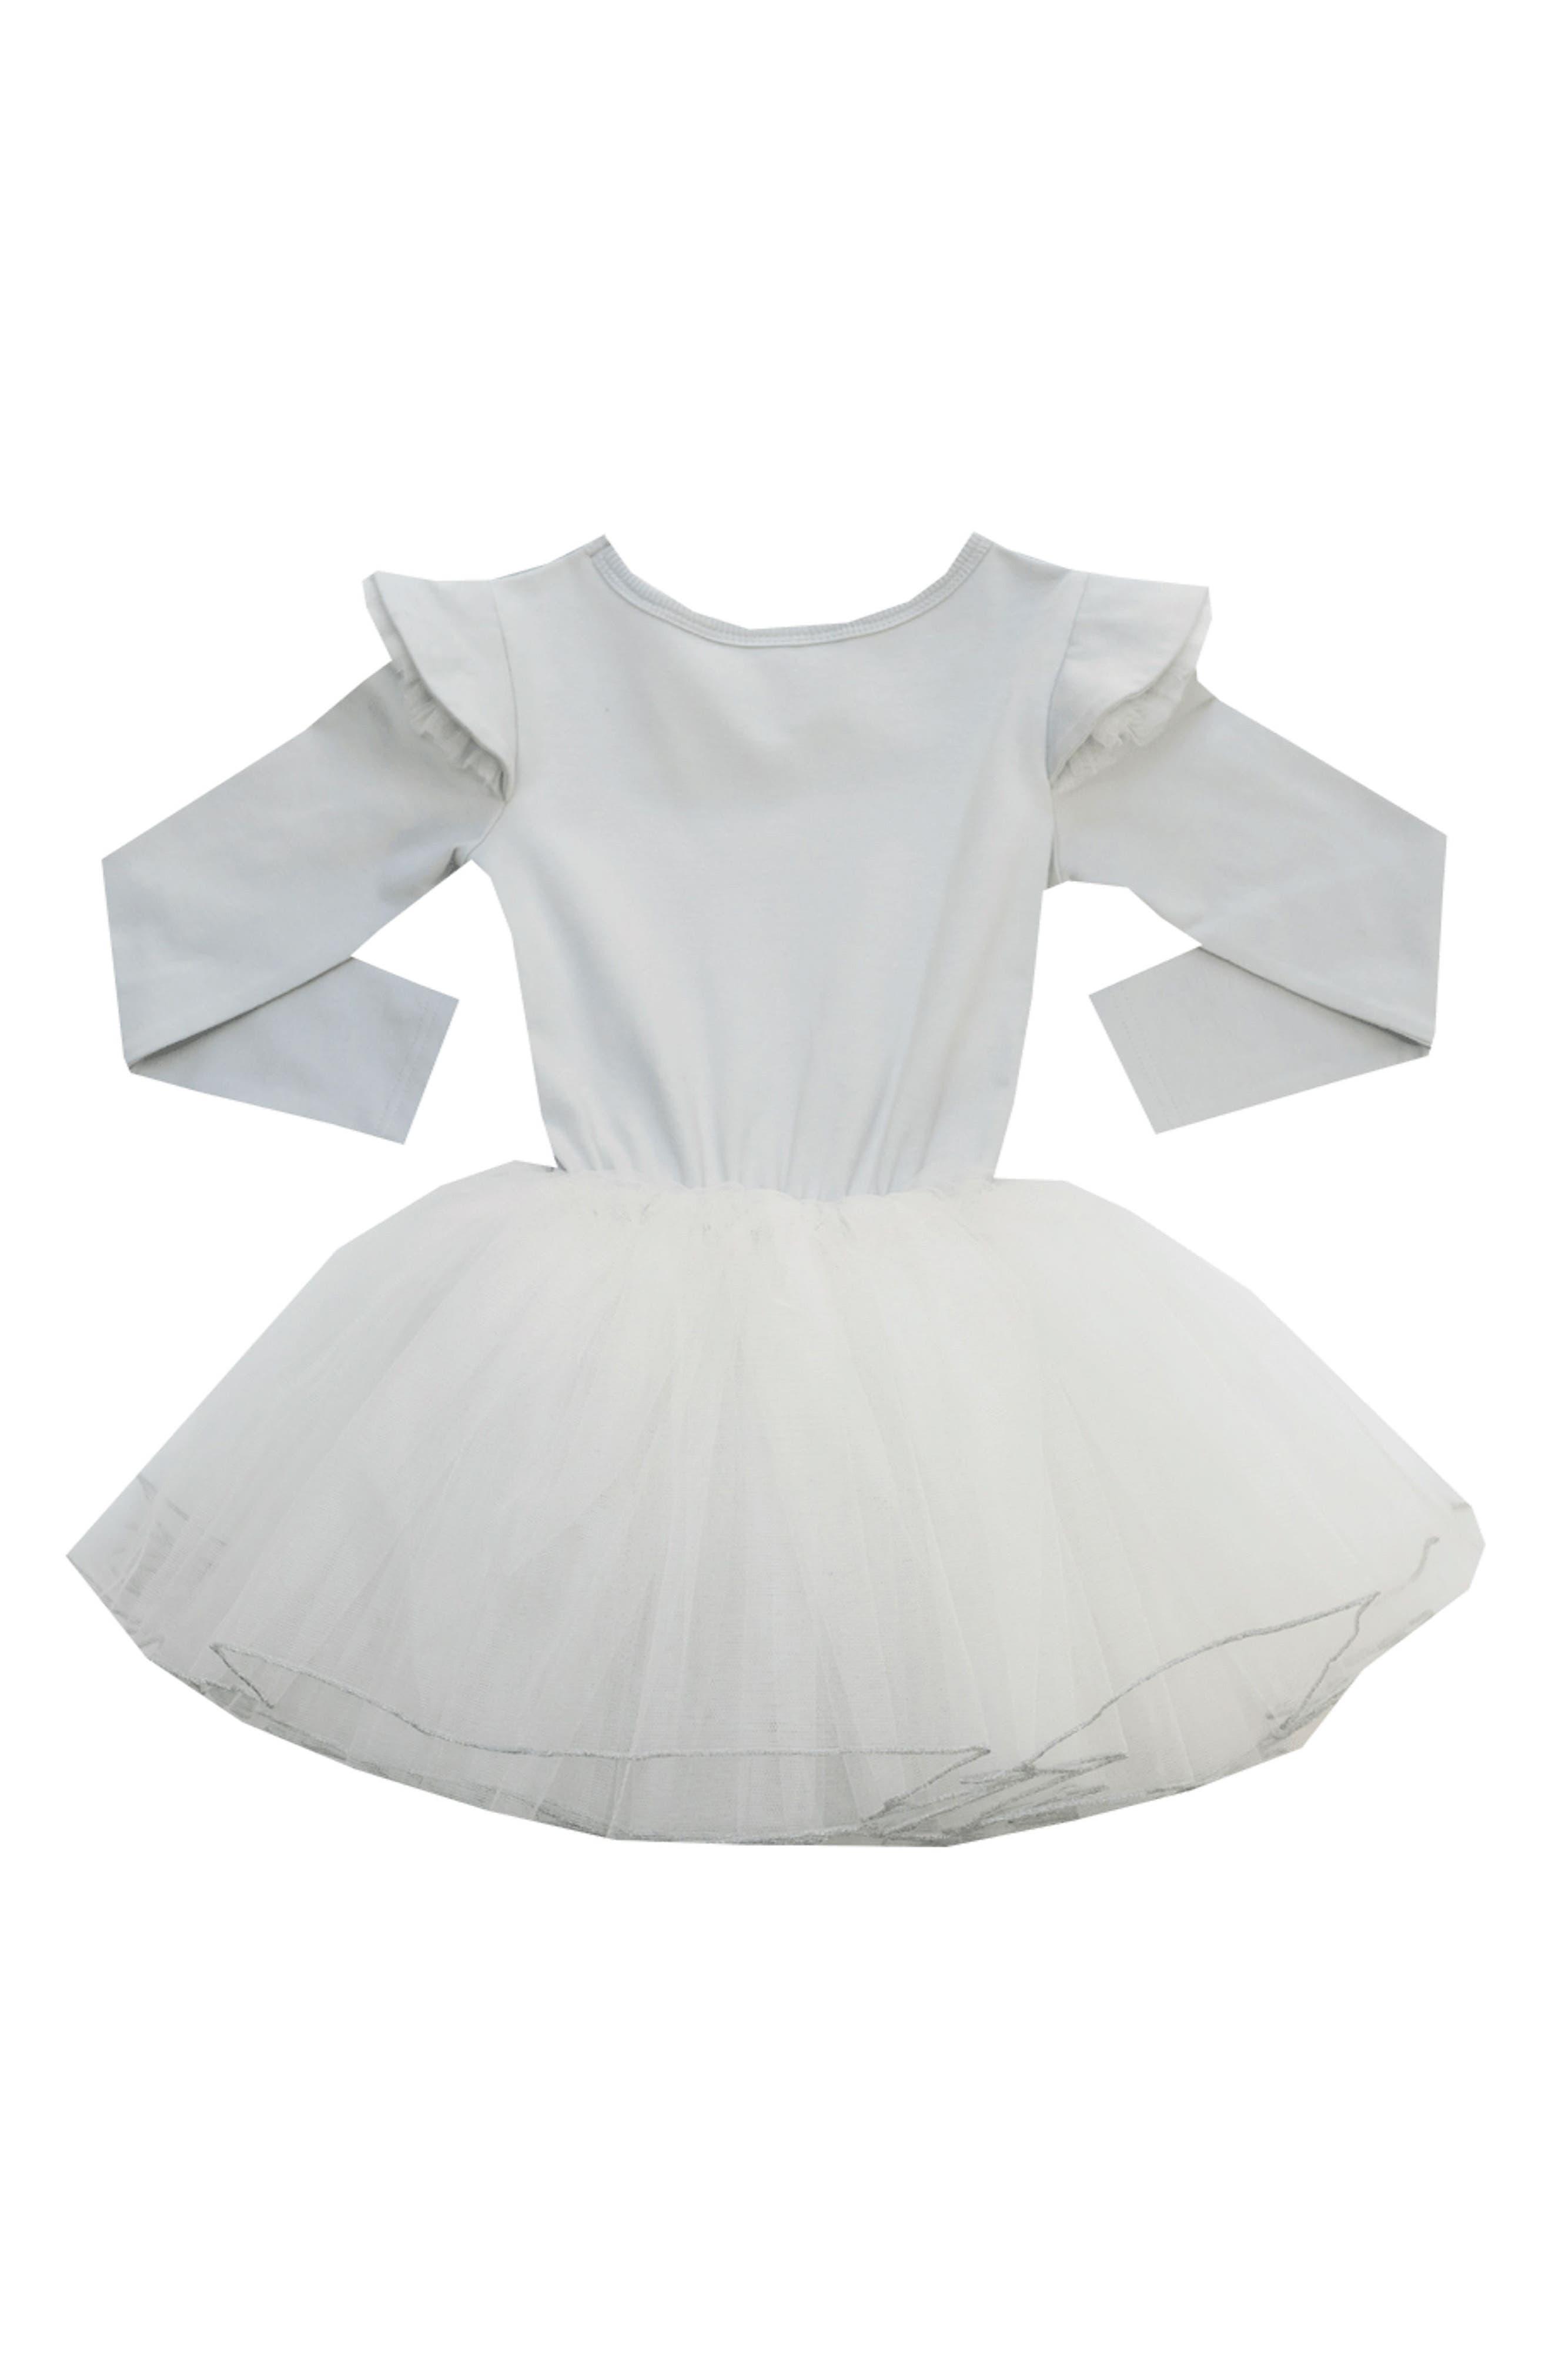 Pierrot Circus Dress,                             Alternate thumbnail 2, color,                             Silver